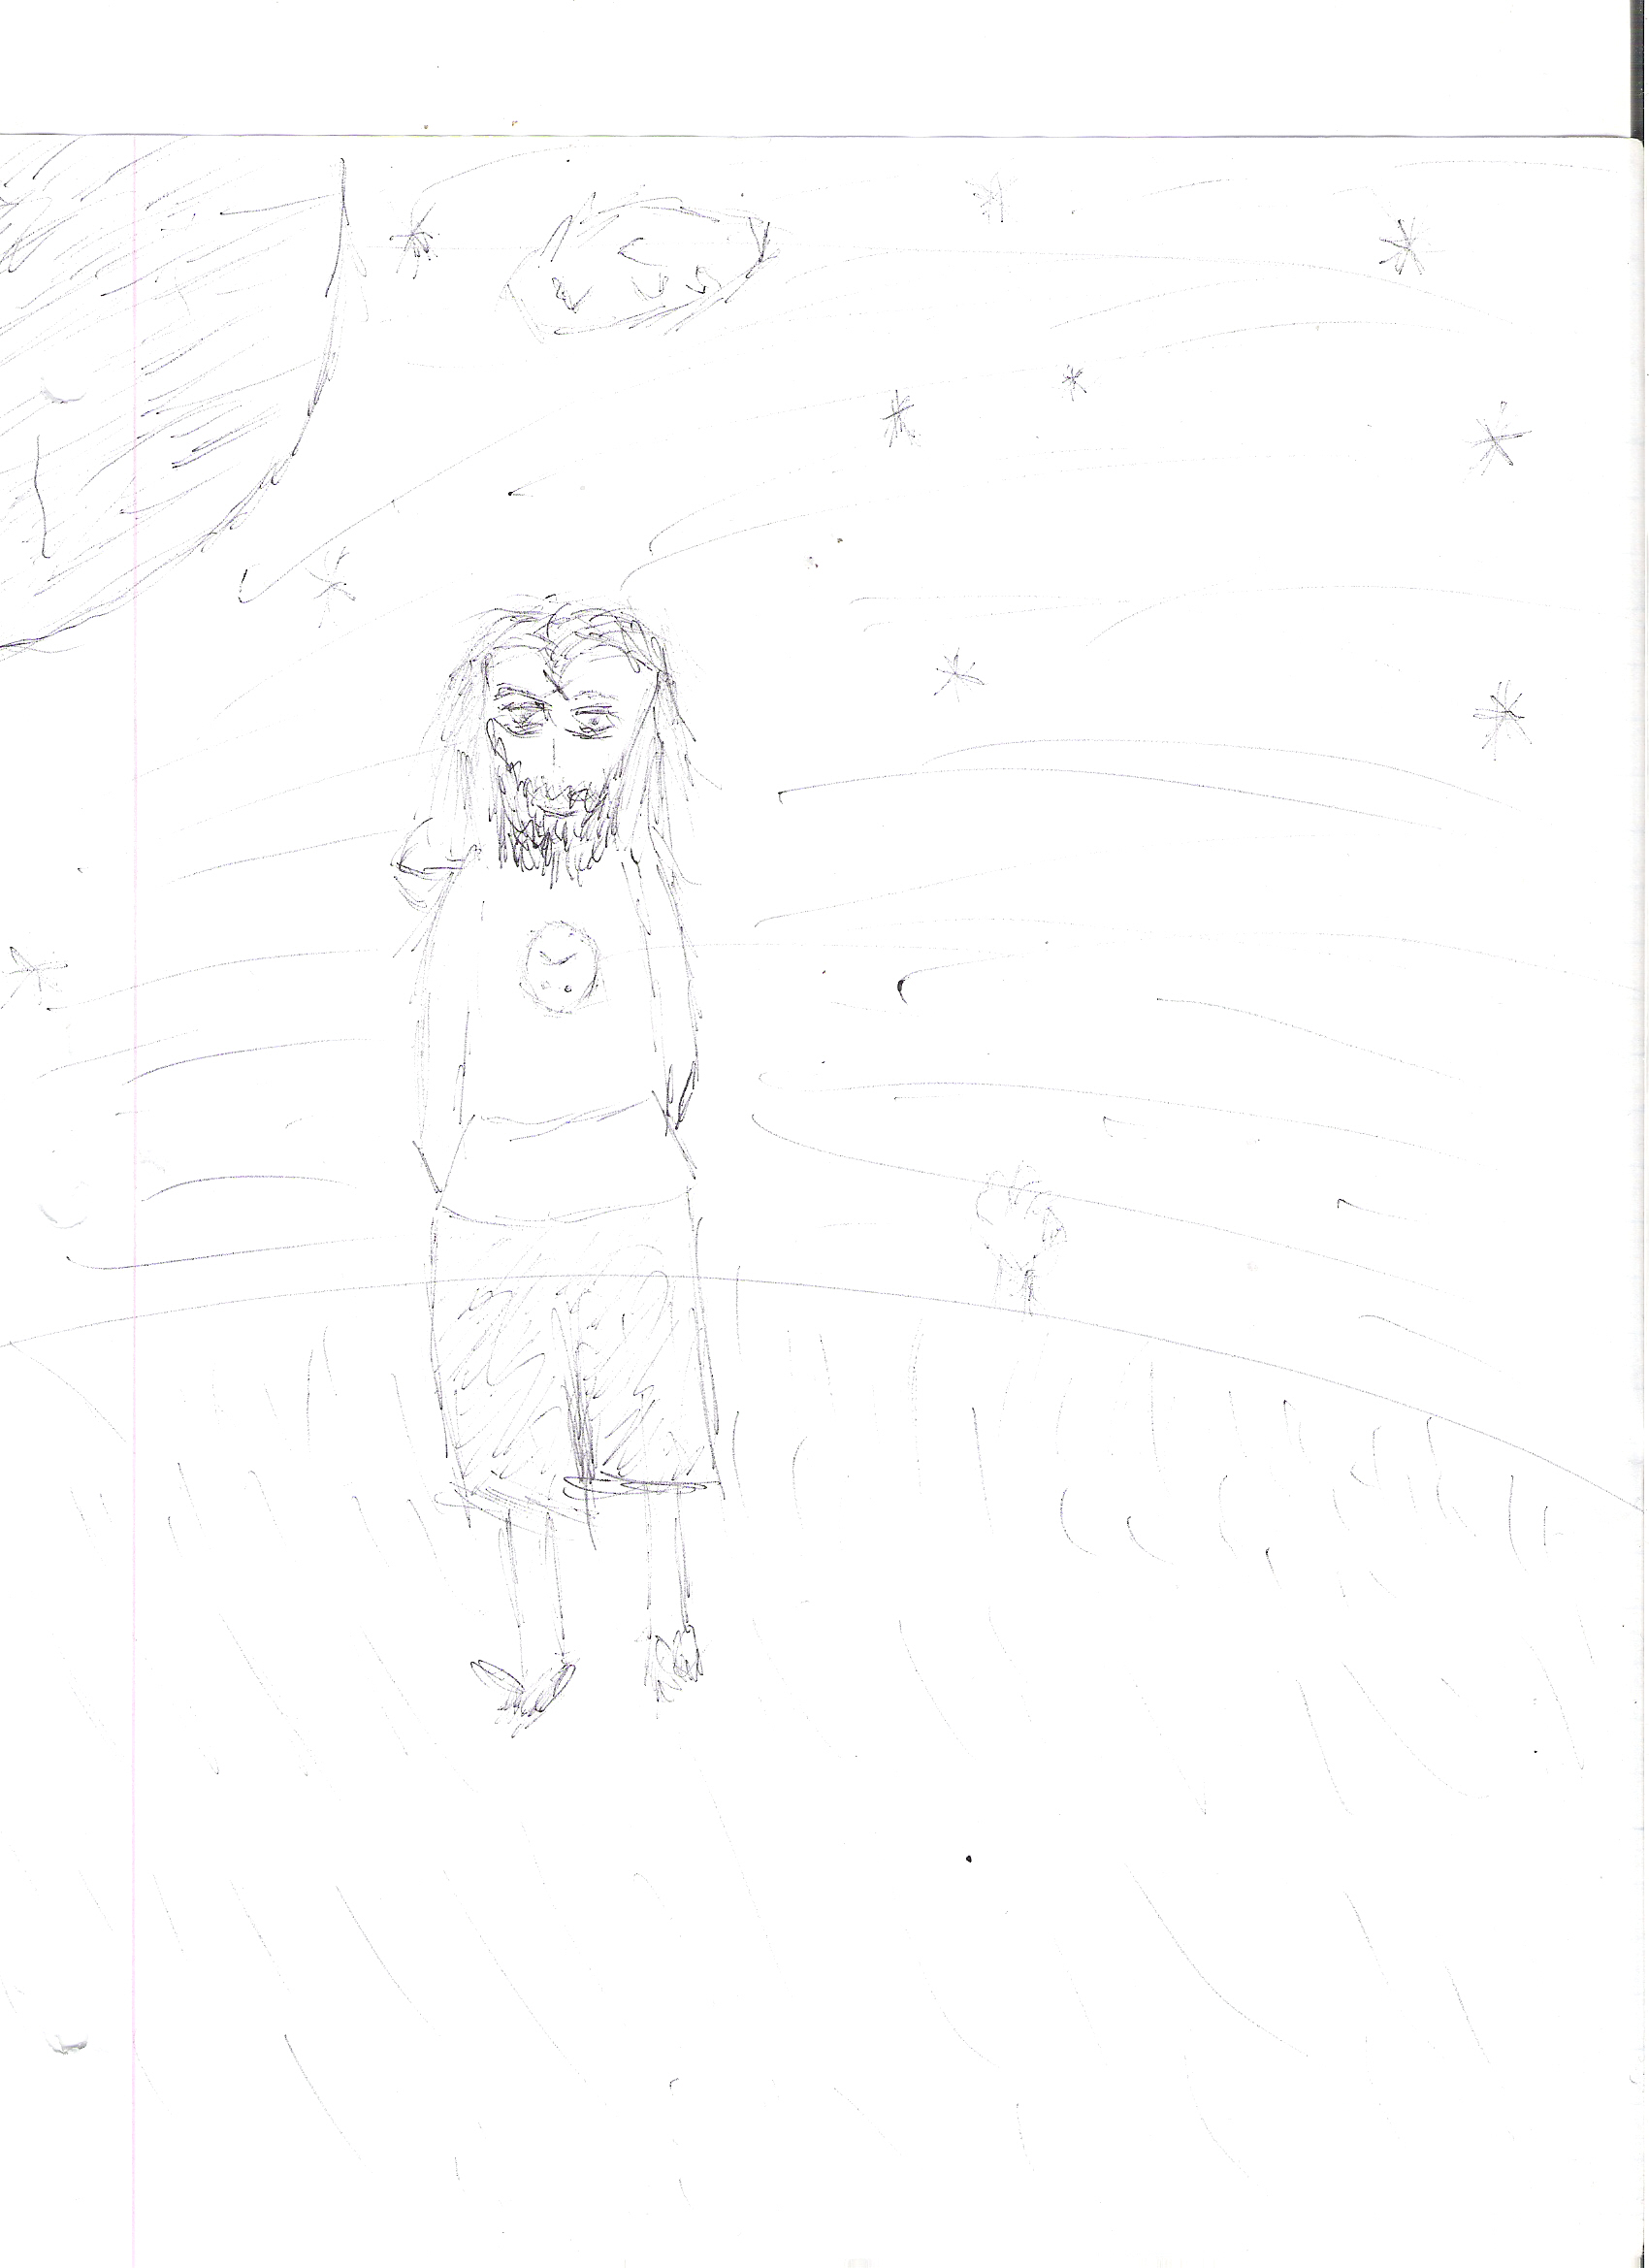 CLU Doodlez #6